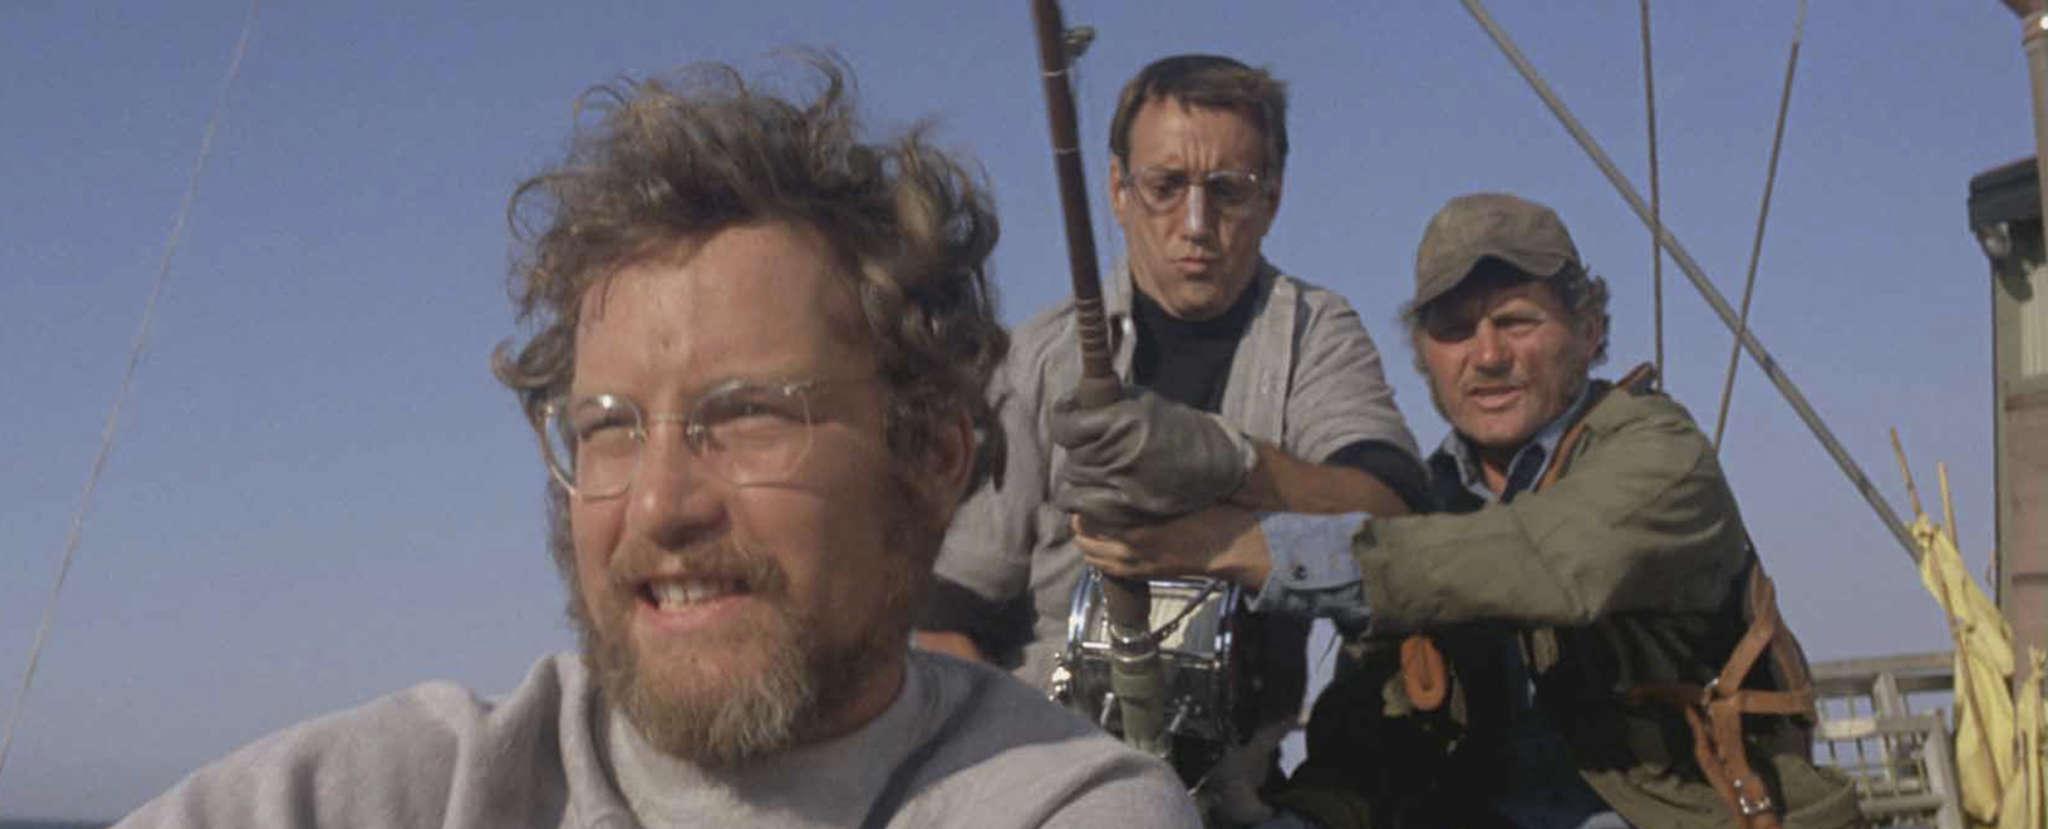 """Jaws"" stars (from left) Richard Dreyfuss , Roy Scheider, and Robert Shaw."